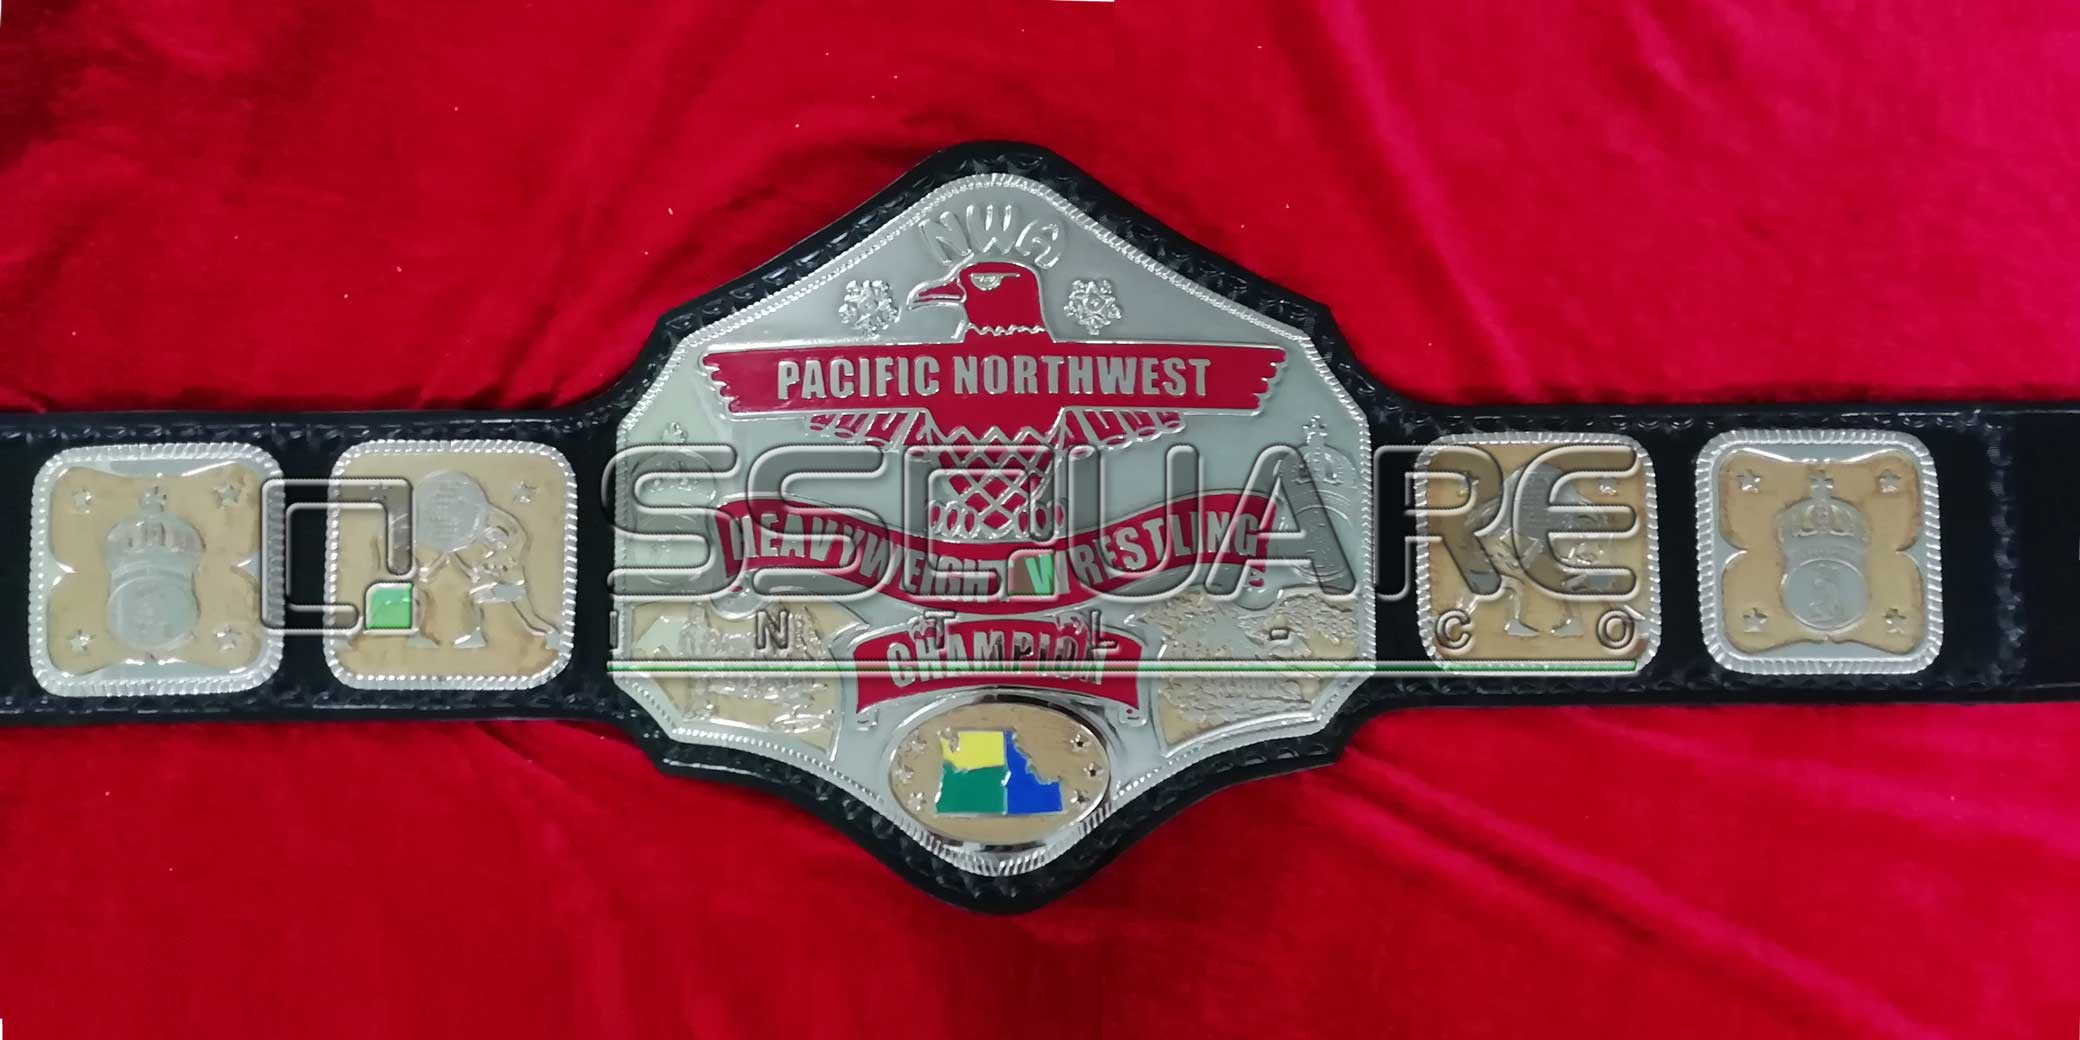 NWA PACIFIC NORTHWEST